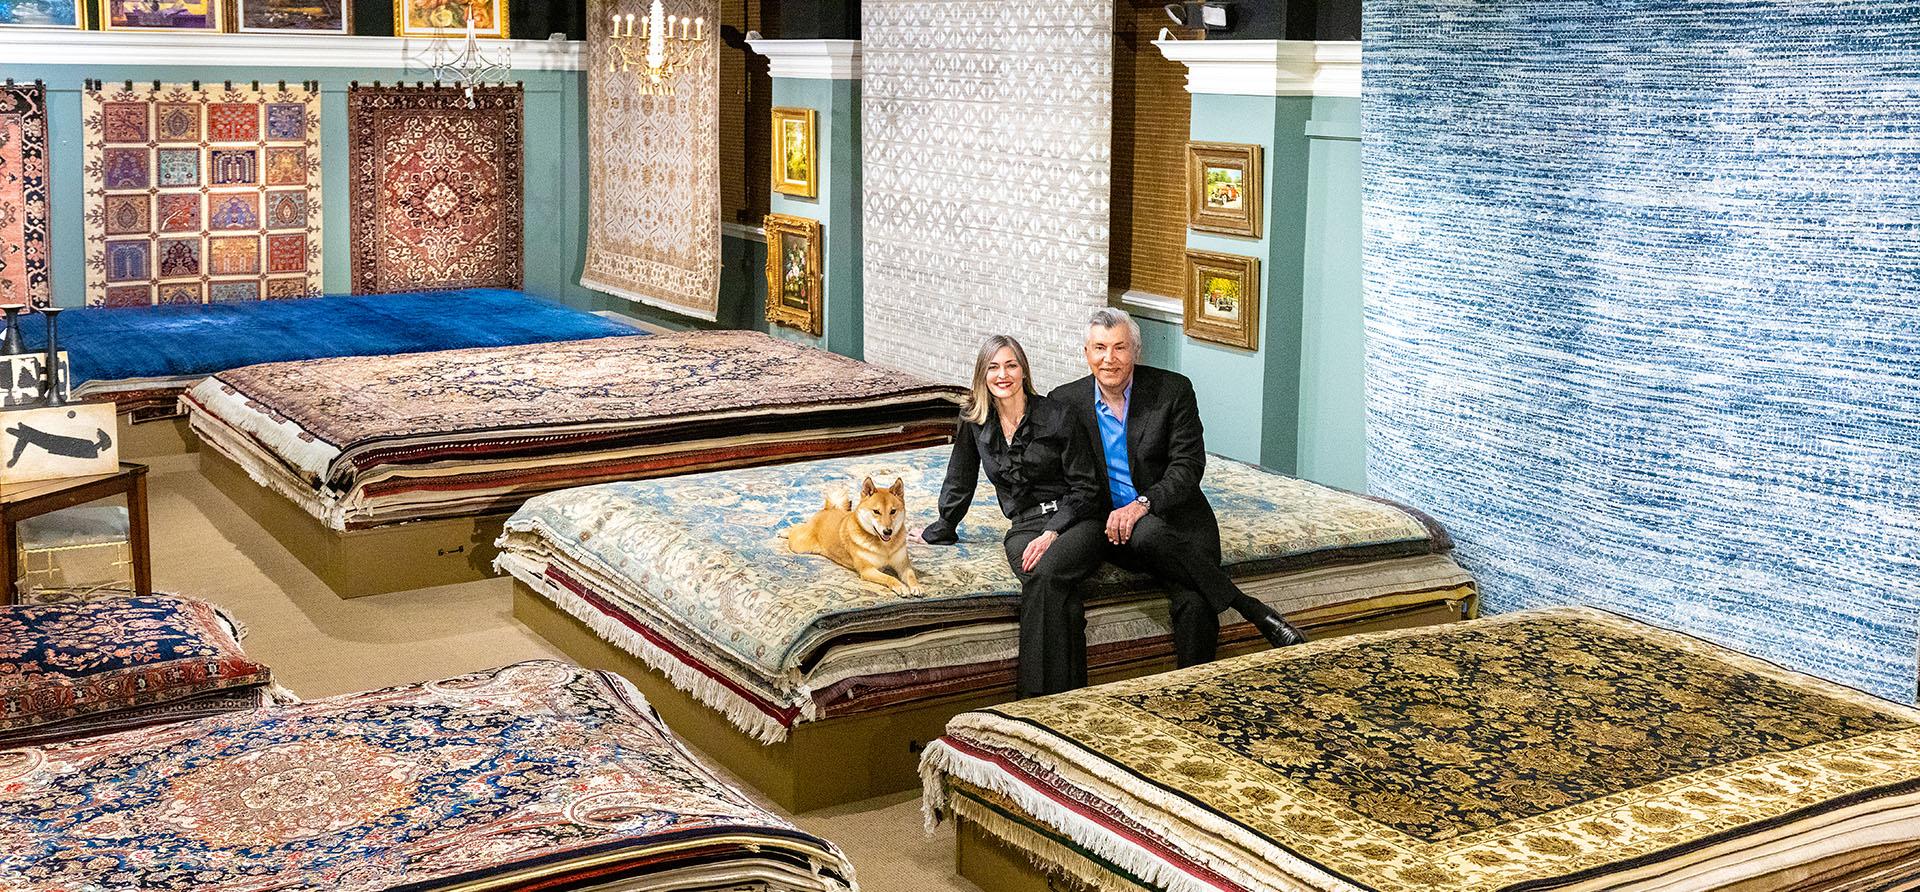 Birmingham Design Studio High End Oriental and Persian Rug Store Owners Kamran Karimpour and Kristi Karimpour